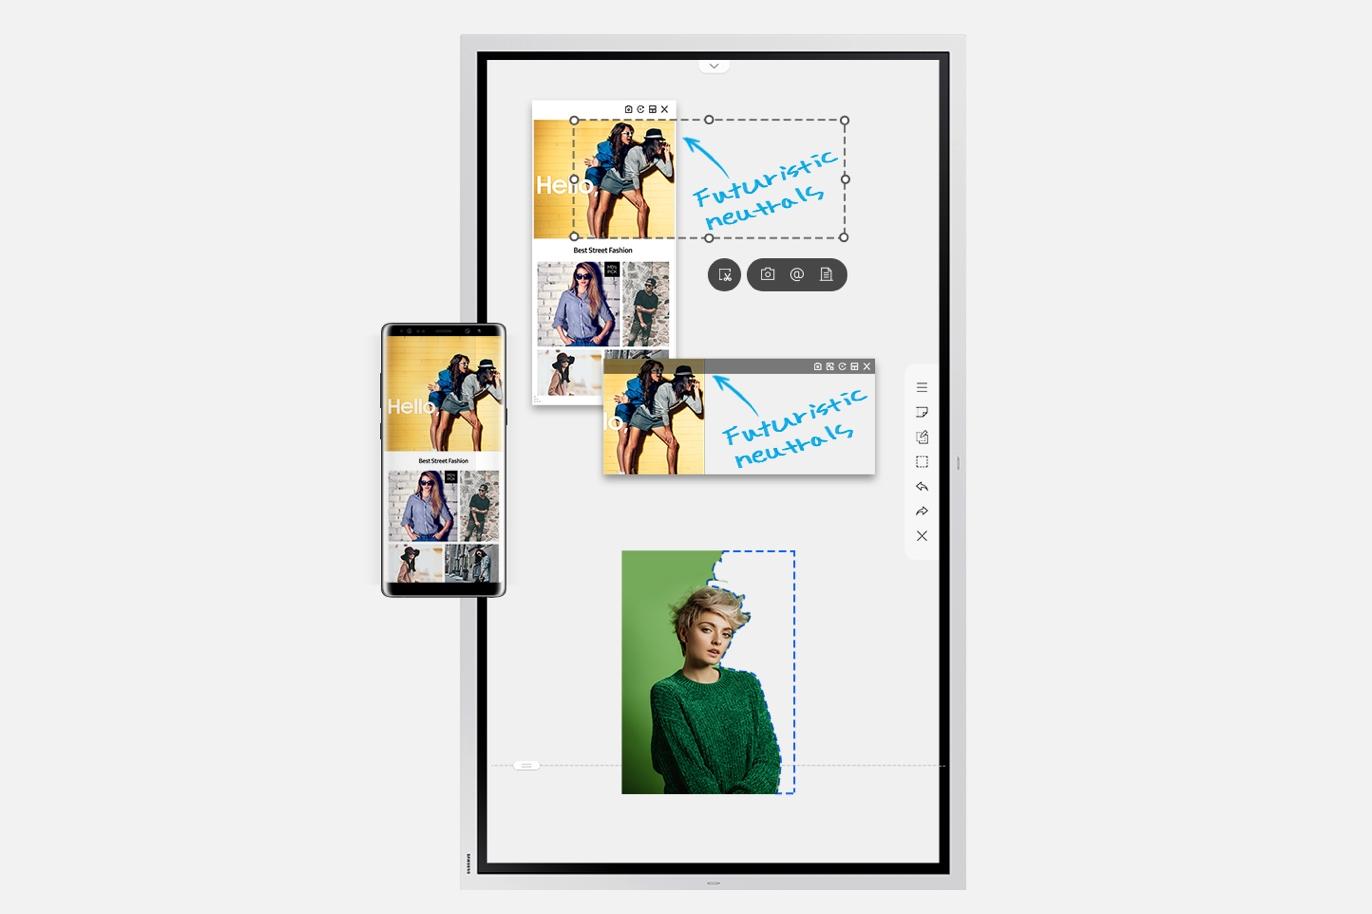 Samsung Flip 2—全新數位屏幕 - PC Flip2 55inch 04 6 1 THREE COLUMN